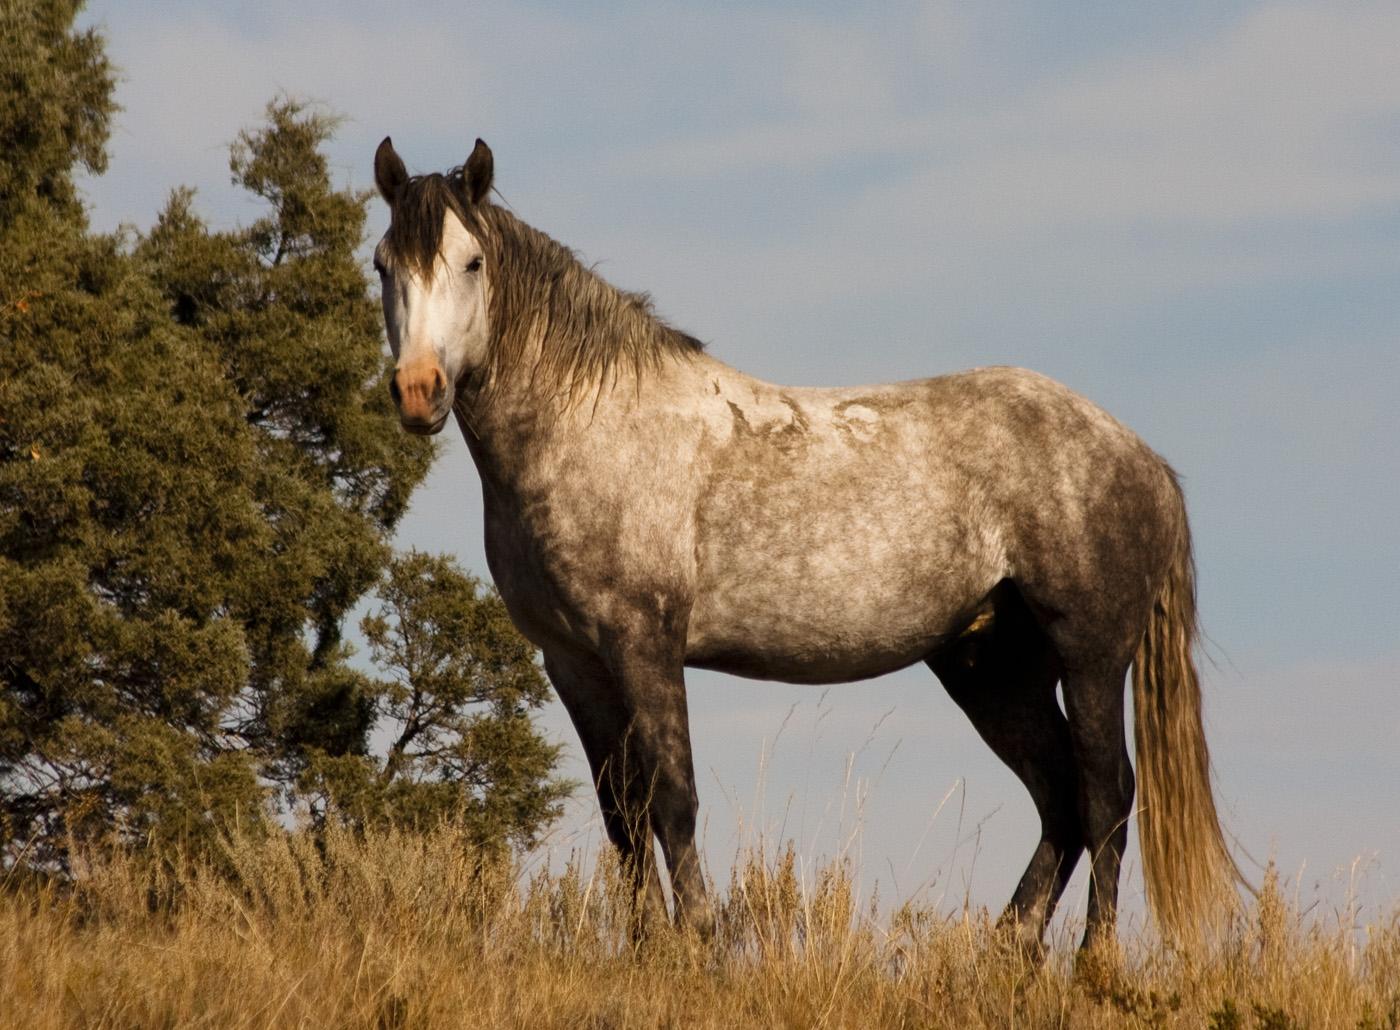 hemp-oil-for-horses-feeding-hemp-oil-hemp-equine-hemp-oil